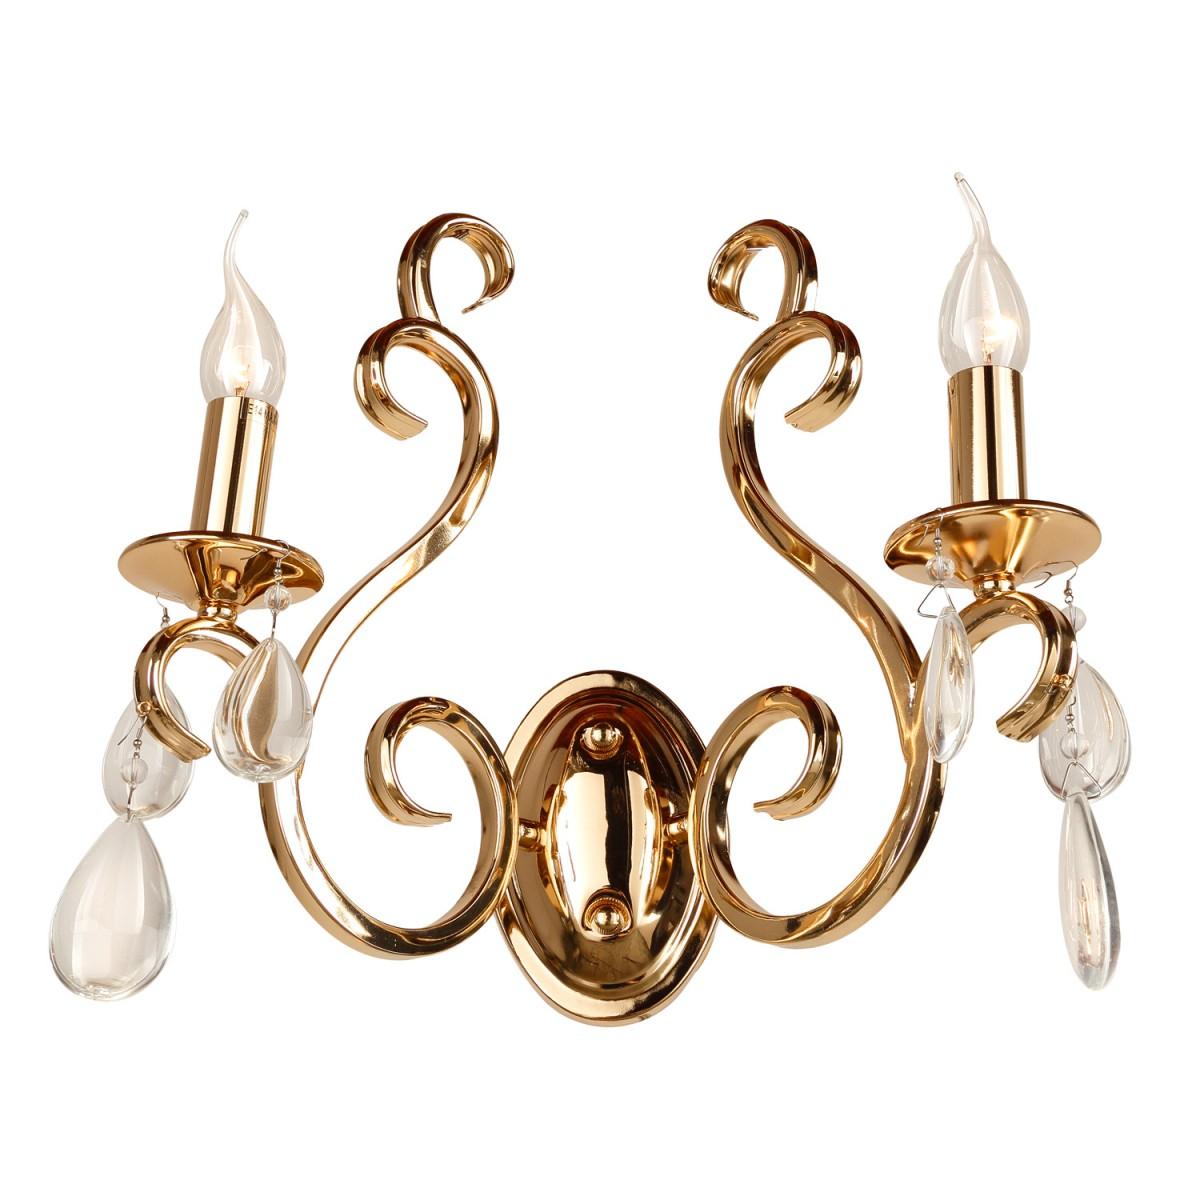 Coole Dekoration Kronleuchter Creme Design. Kronleuchter Oval Gold  10 Armig, Hängelampe Farbe Gold Breite 120 Cm